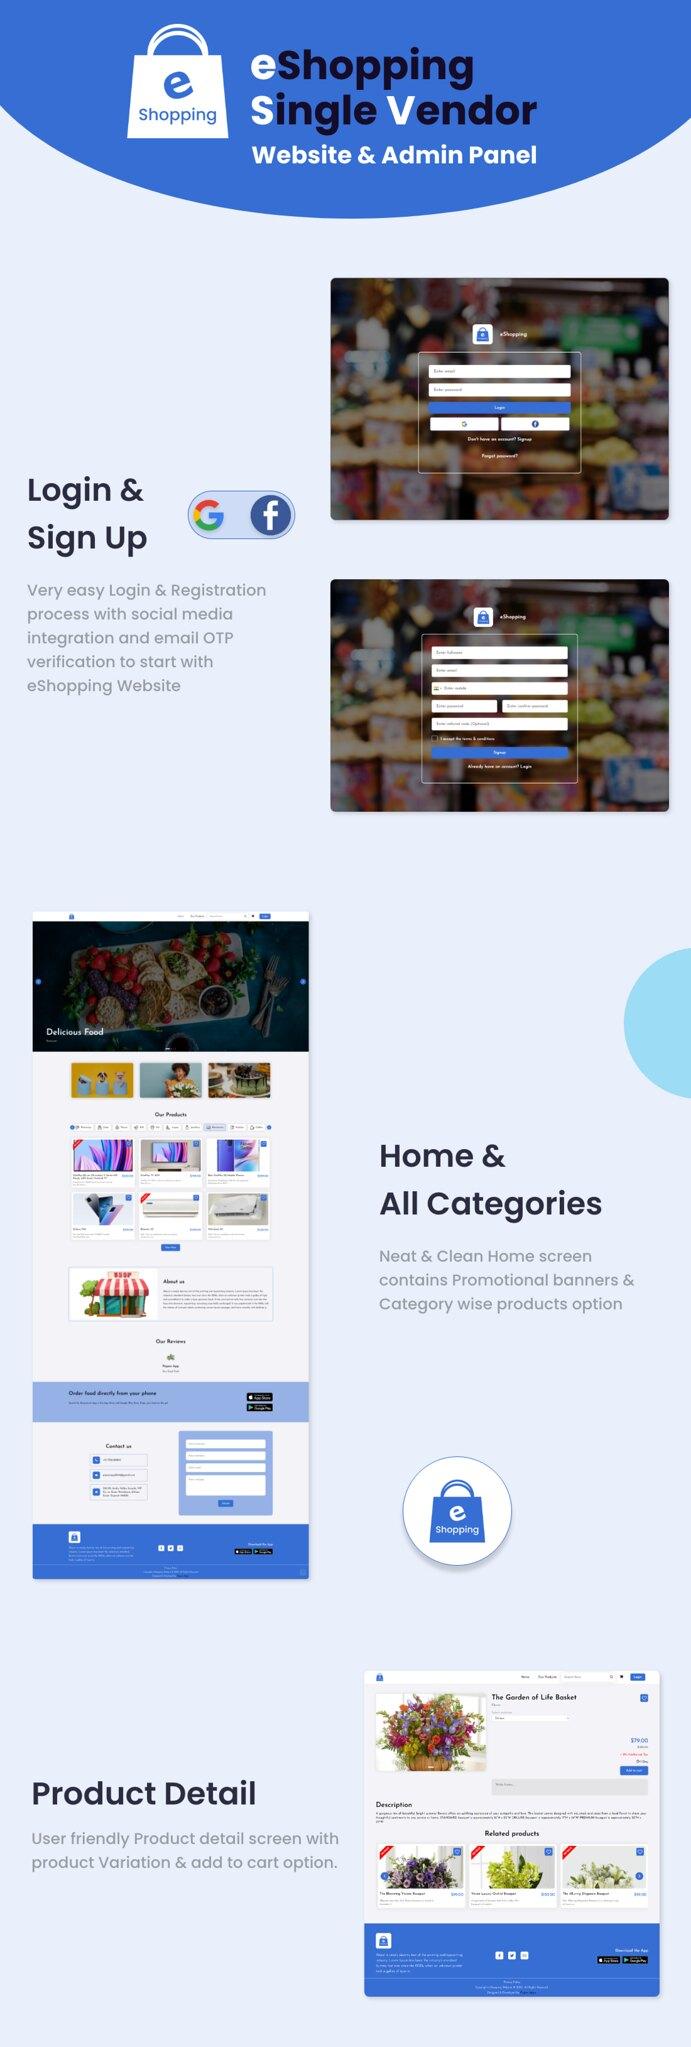 eShopping | Single Vendor Multi Purpose eCommerce System - Laravel Website - 9